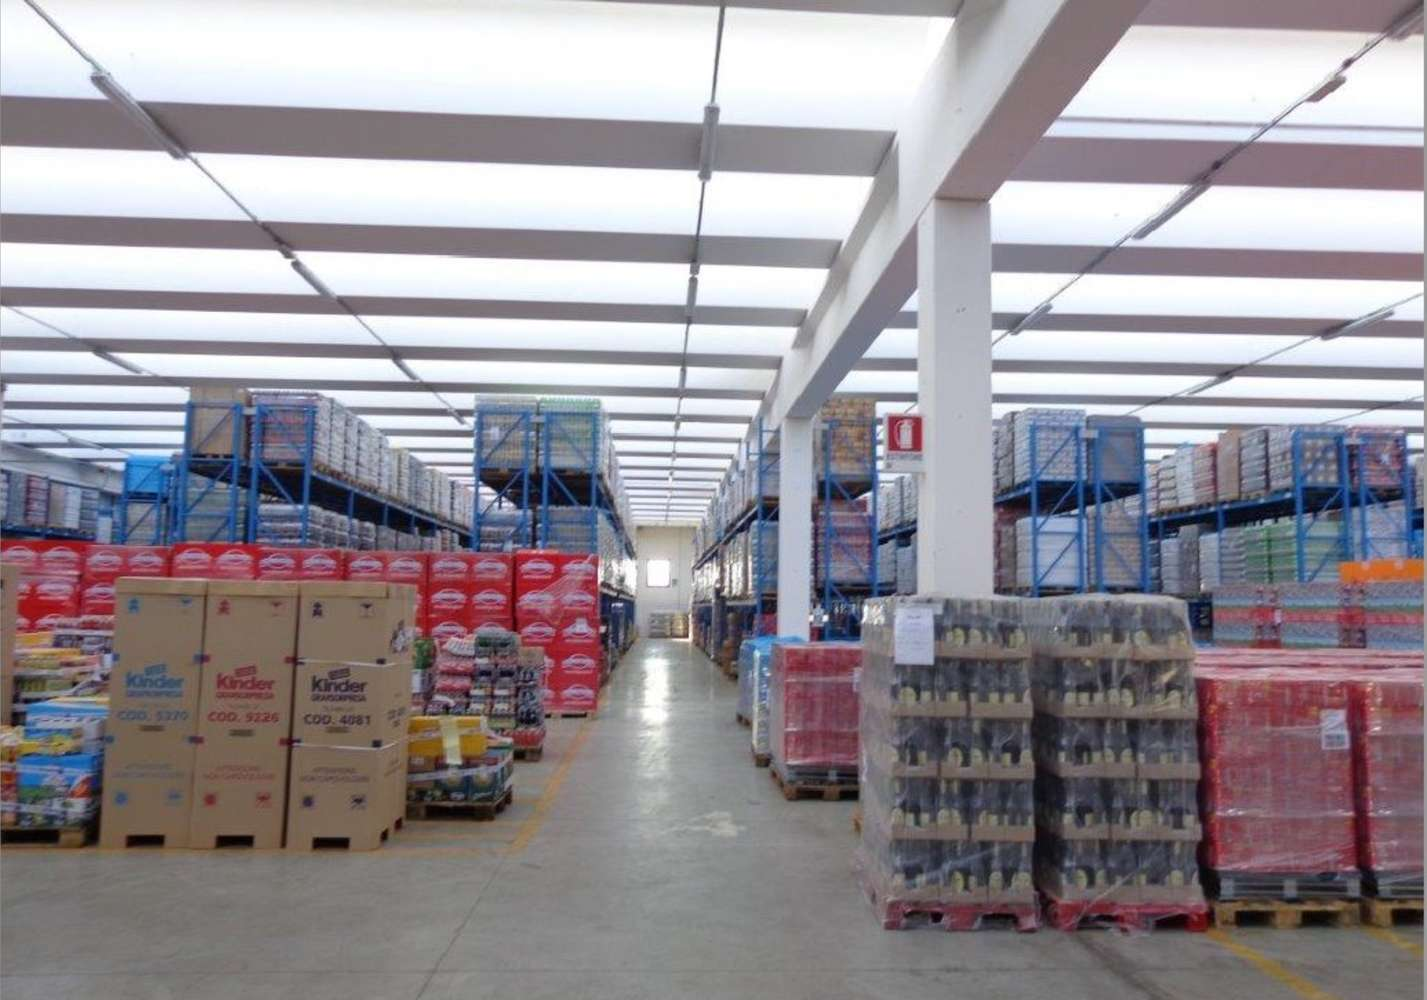 Magazzini industriali e logistici Mozzecane, 37060 - Mozzecane magazzini logistici - 10926882